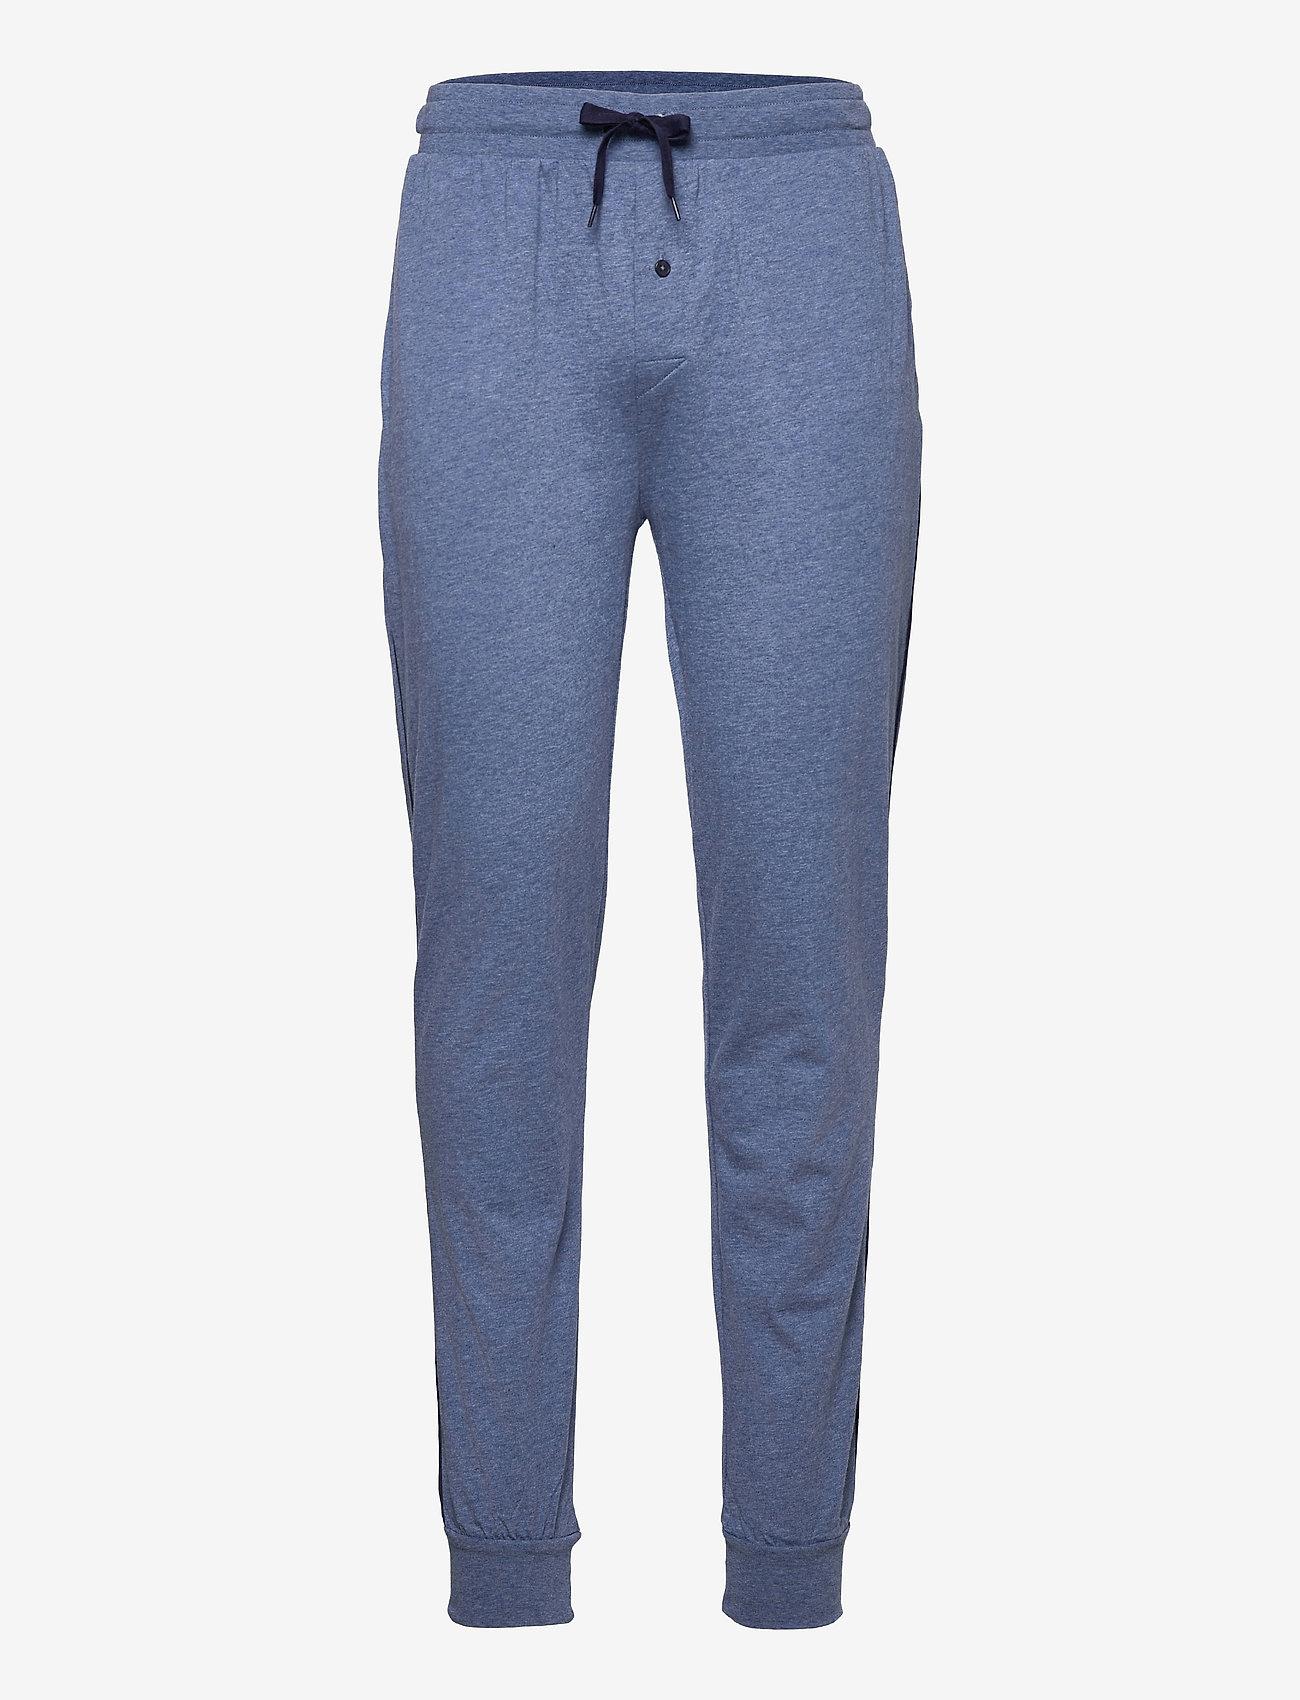 GANT - JERSEY PAJAMA PANTS - bottoms - denim blue mel - 0